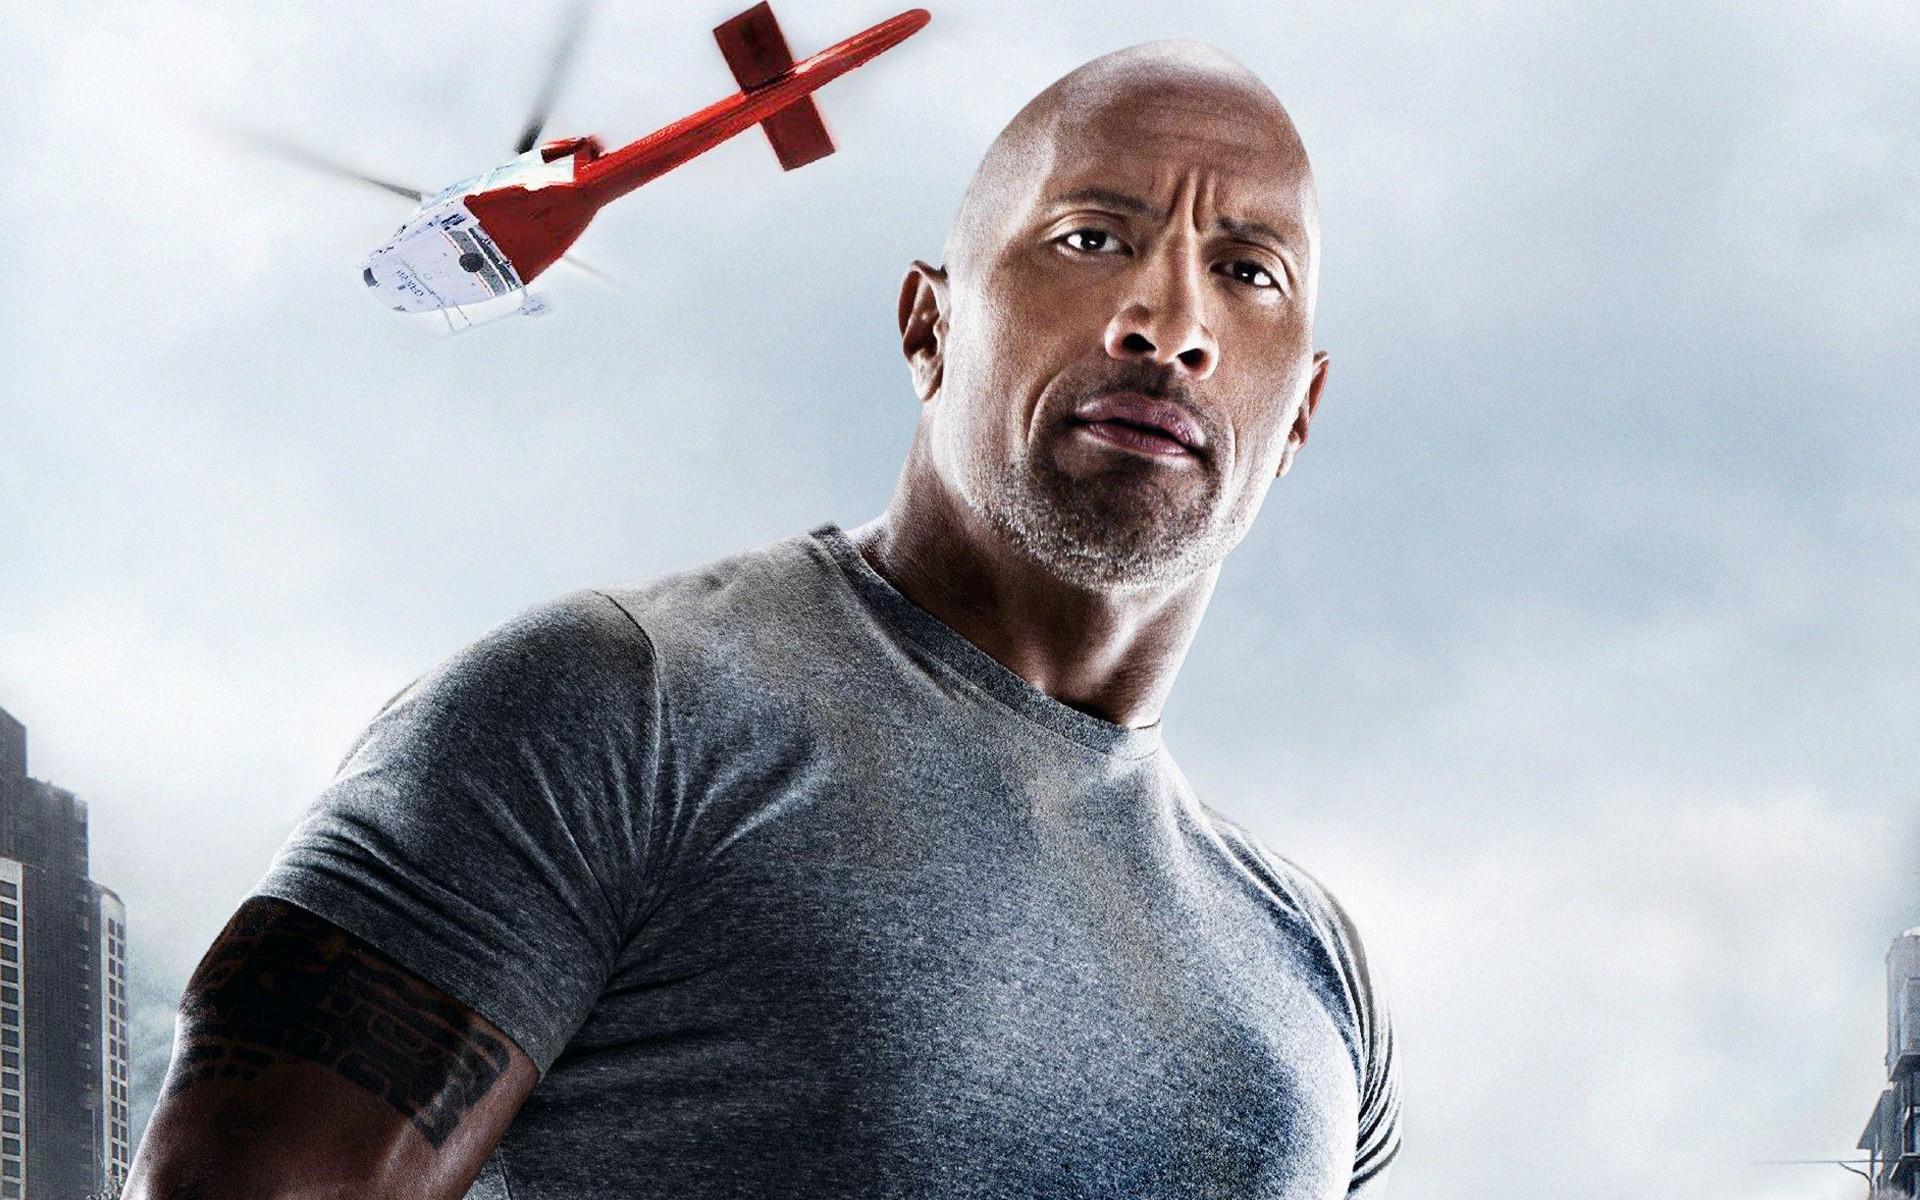 Dwayne Johnson In San Andreas Movie, HD Movies, 4k